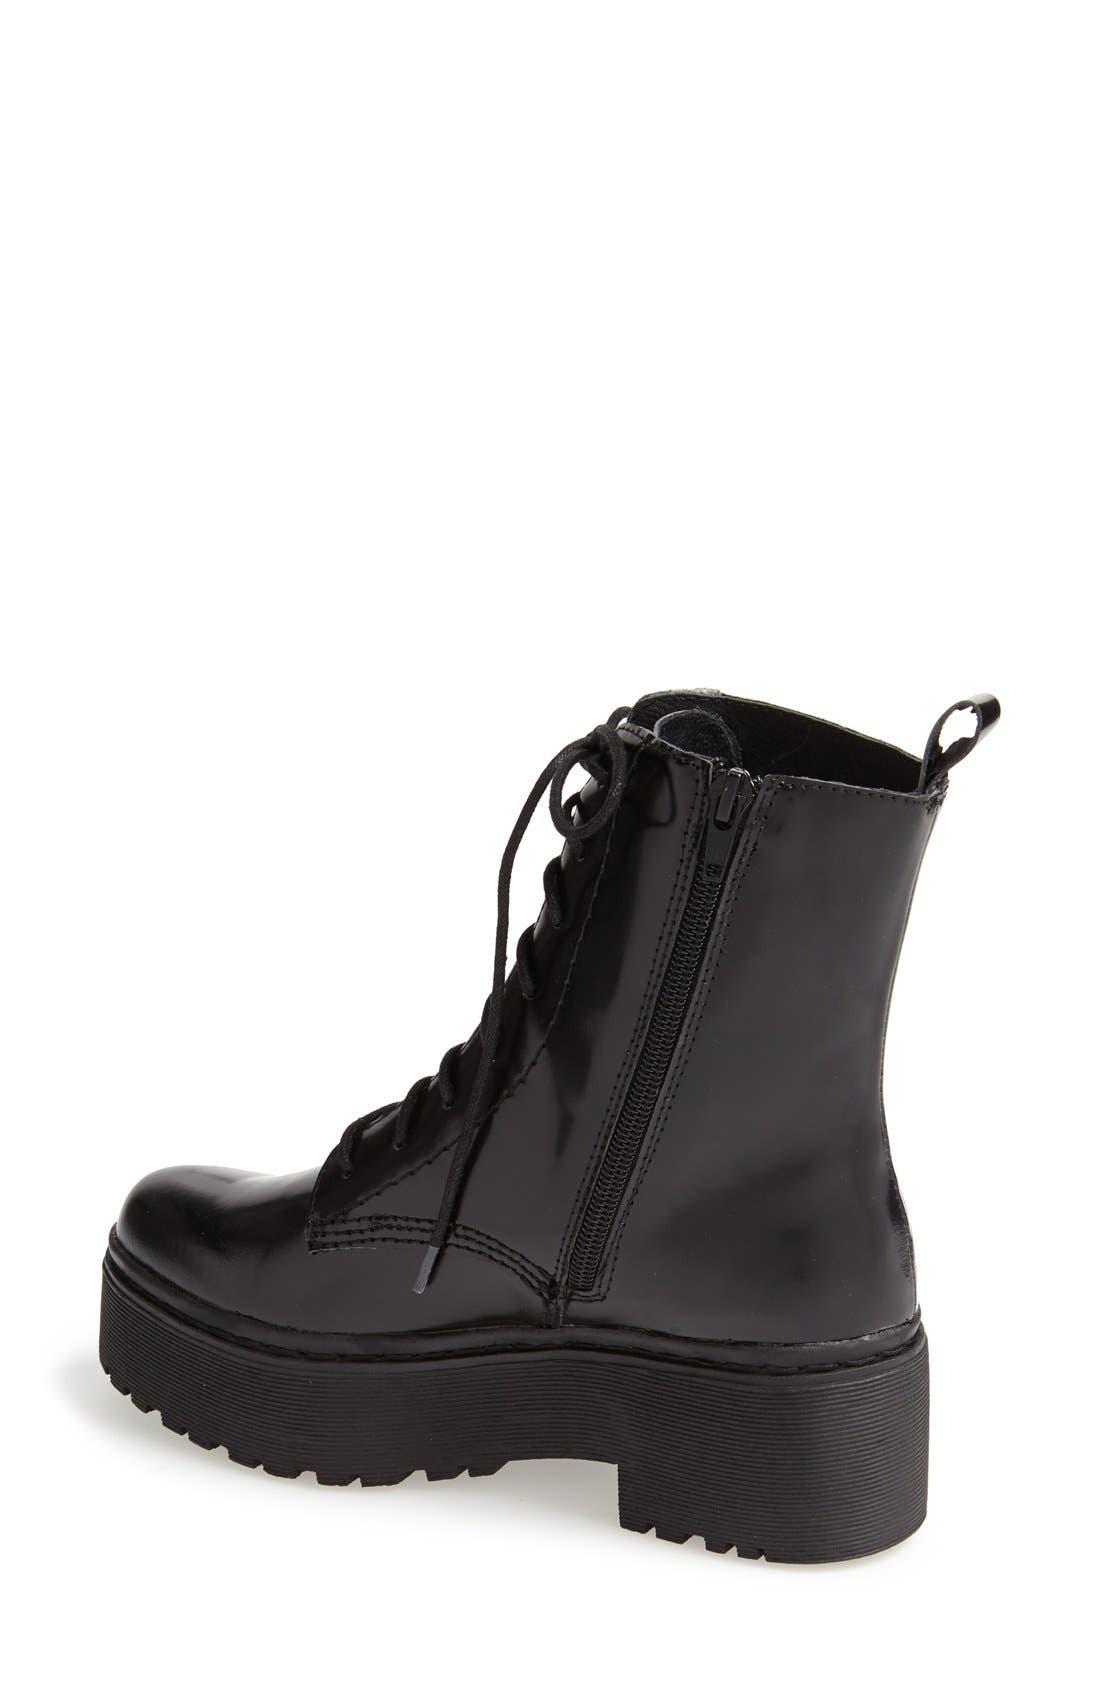 'Finnick' Boot,                             Alternate thumbnail 2, color,                             Black